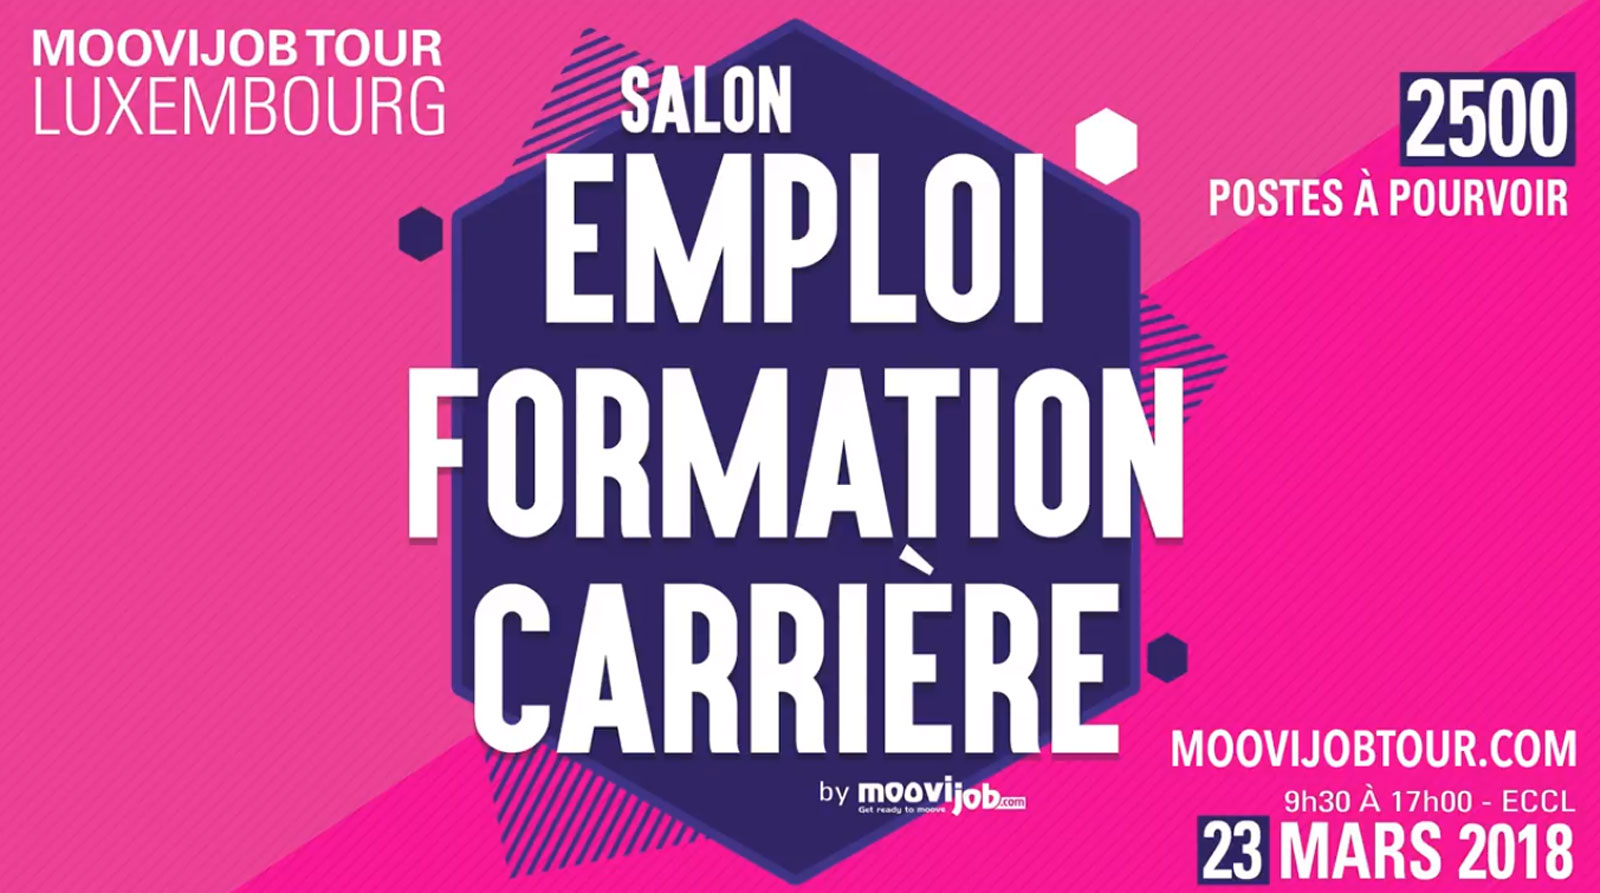 salon emploi moovijob tour 2018 au luxembourg